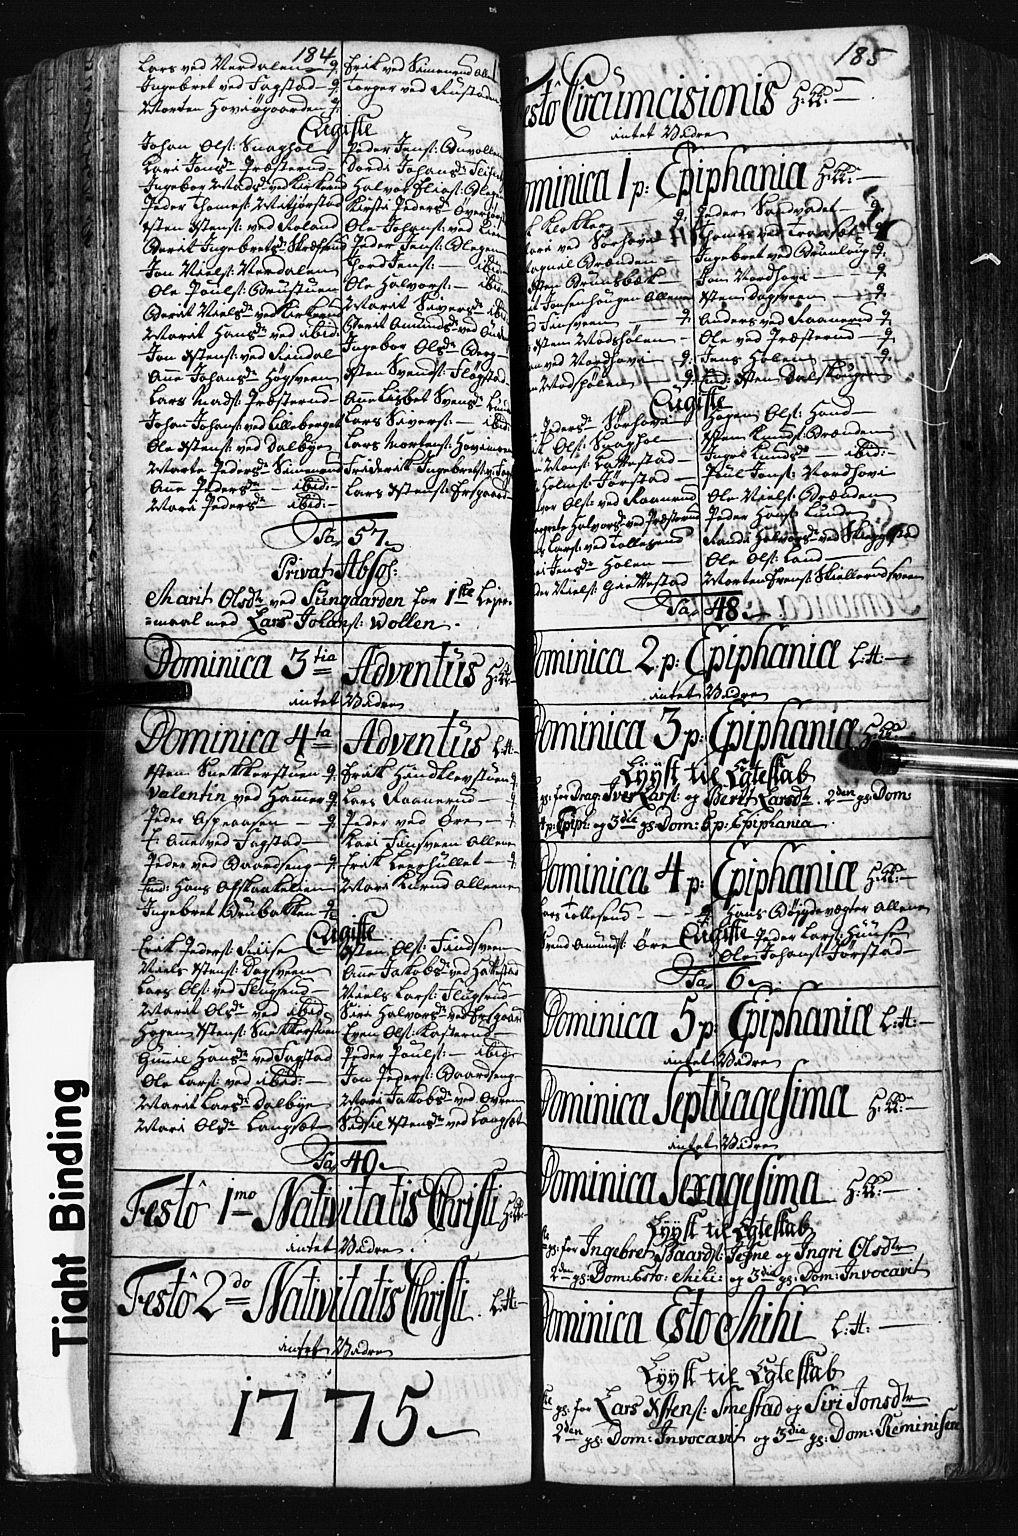 SAH, Fåberg prestekontor, Klokkerbok nr. 3, 1768-1796, s. 184-185